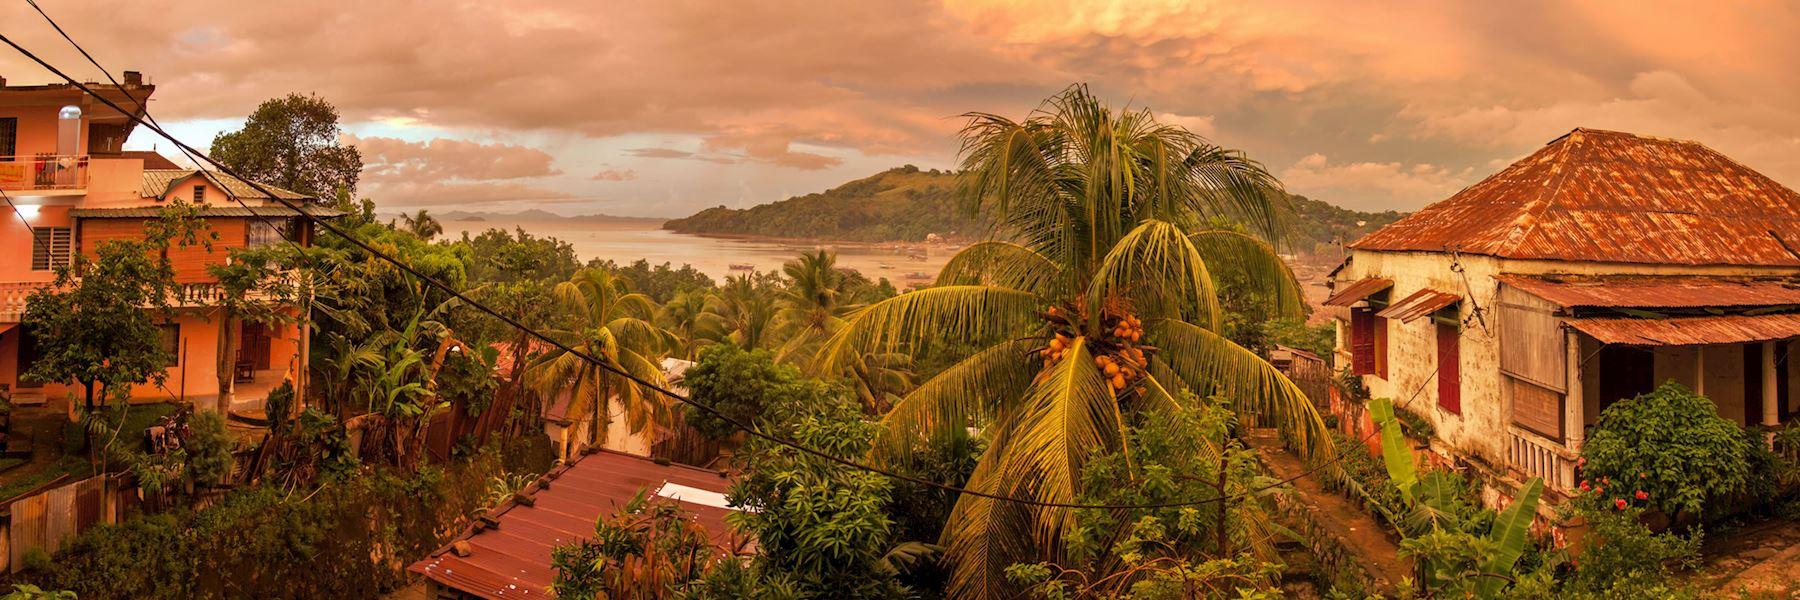 the Islands & Beaches of Madagascar, Madagascar